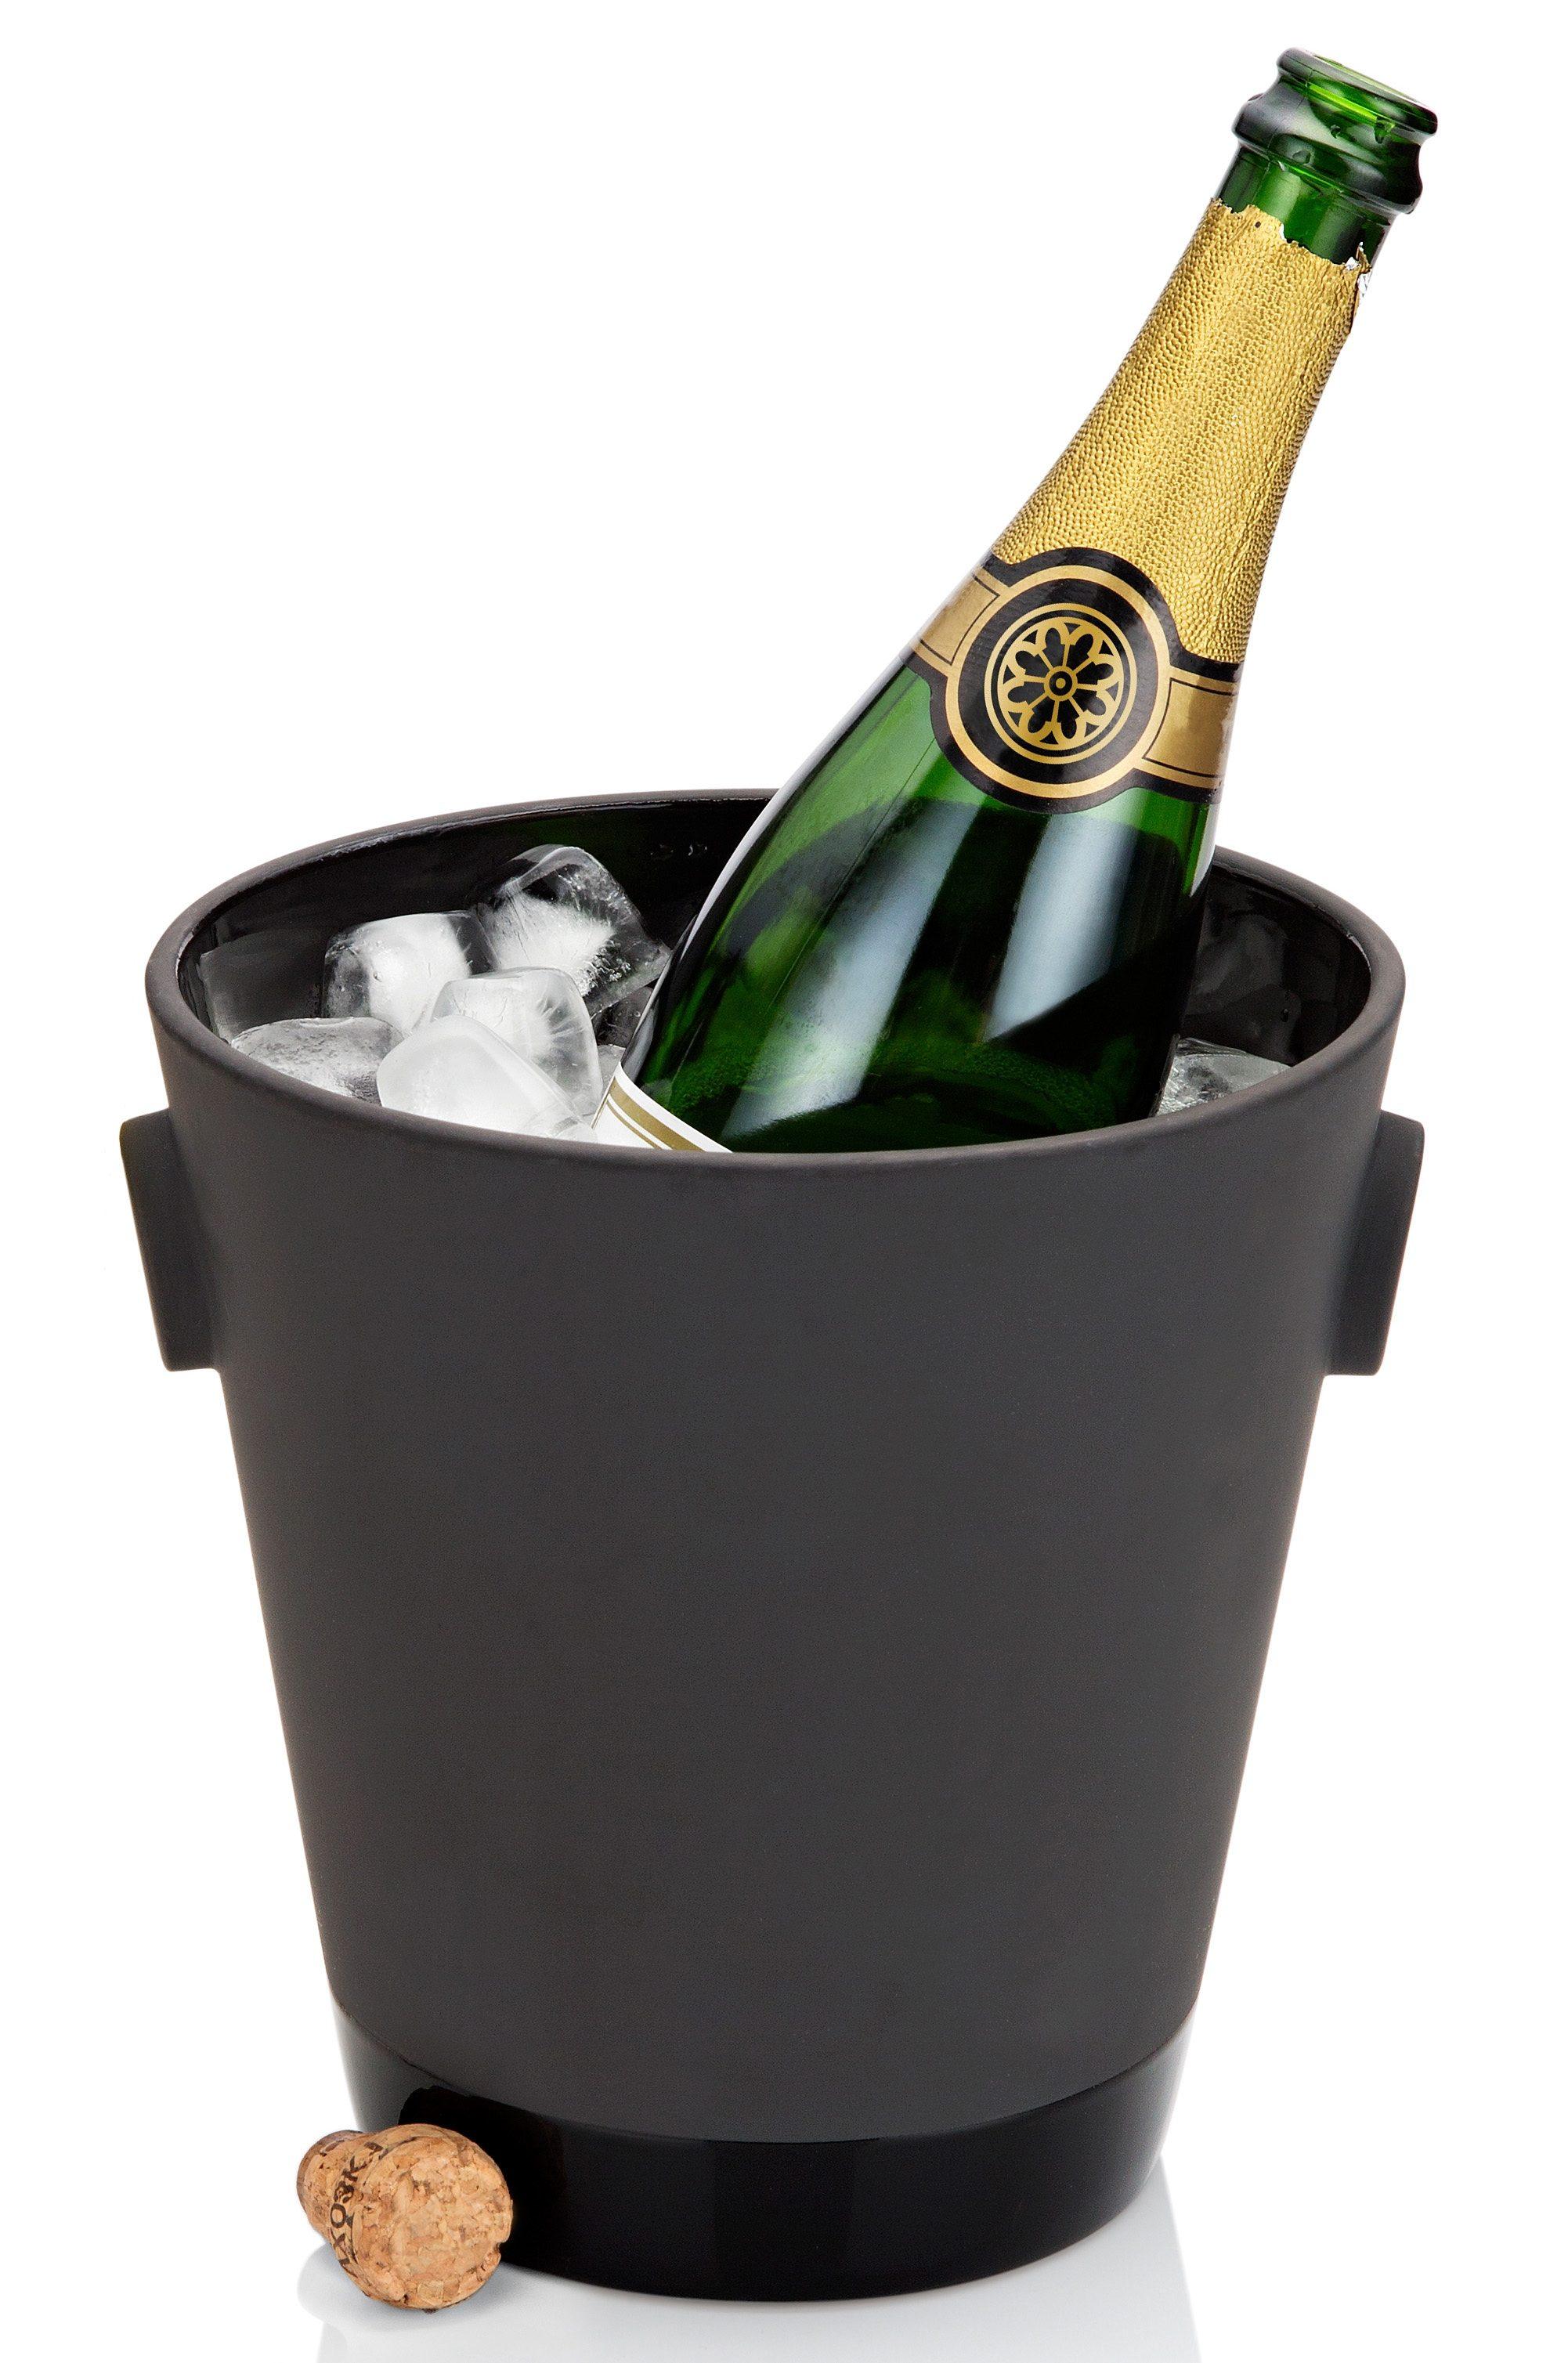 magisso Wein-/ Champagner-Kühler